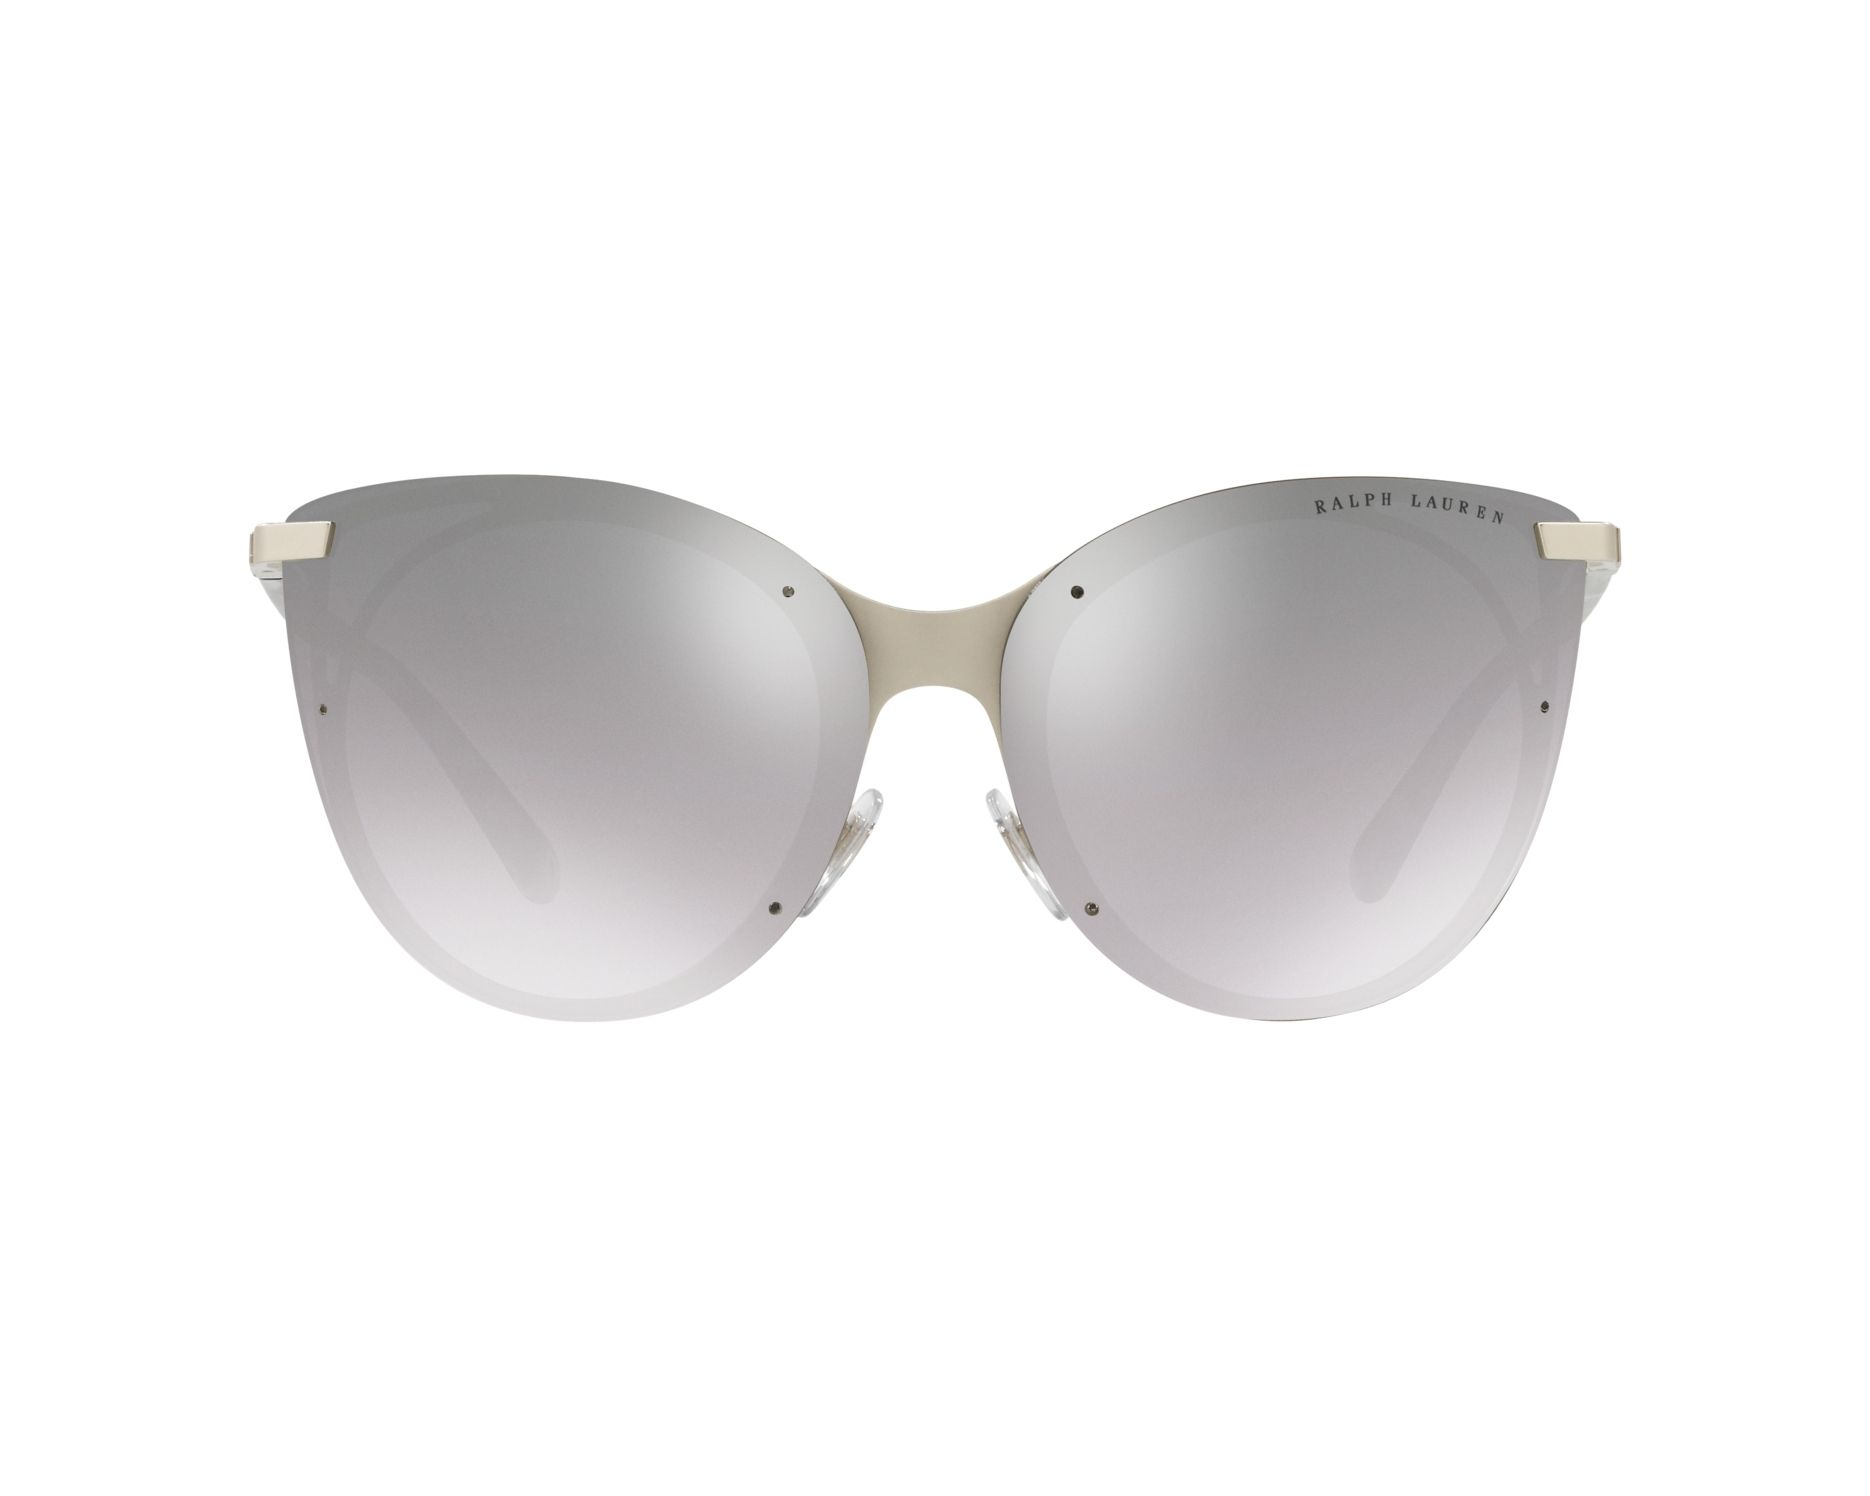 4d43fd6aa01f Sunglasses Ralph Lauren RL-7059 90016V 63-14 Silver Grey 360 degree view 1